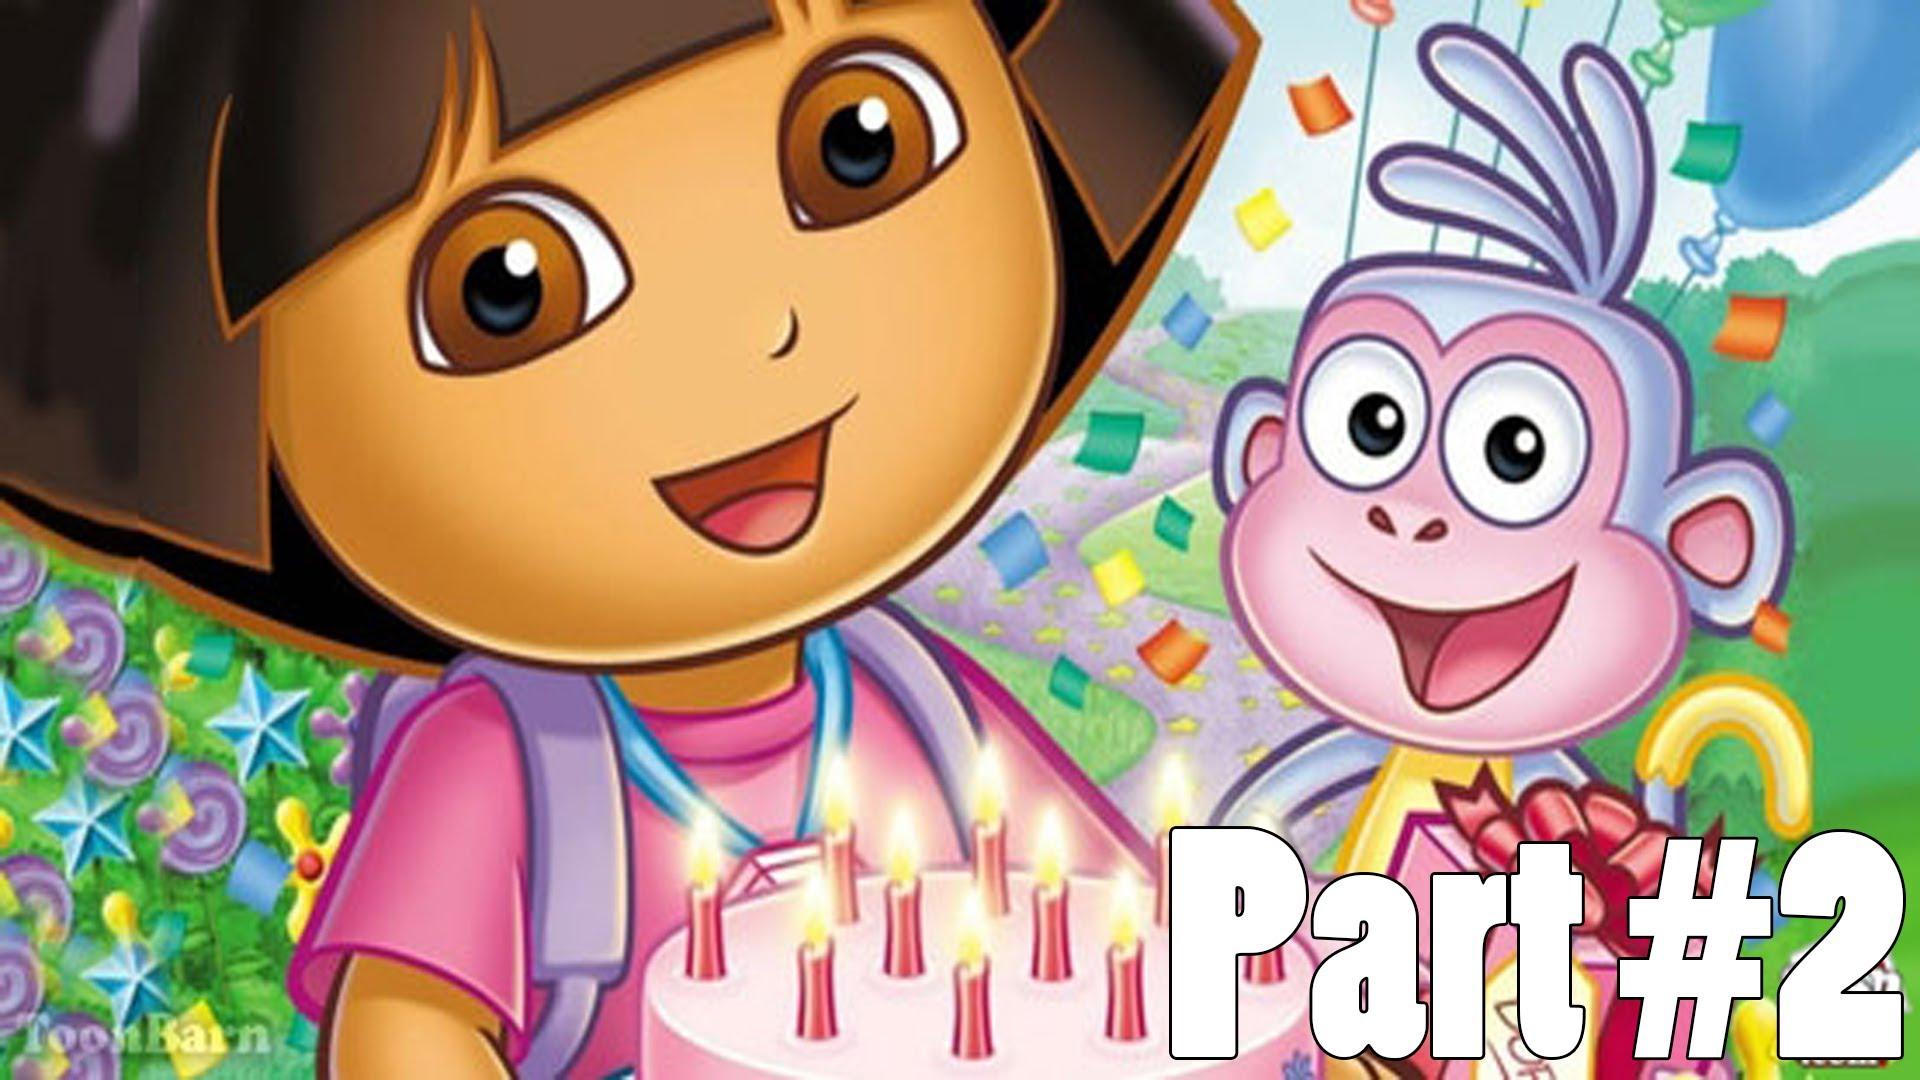 Cute Spongebob Squarepants Wallpaper Dora Backgrounds Download Pixelstalk Net